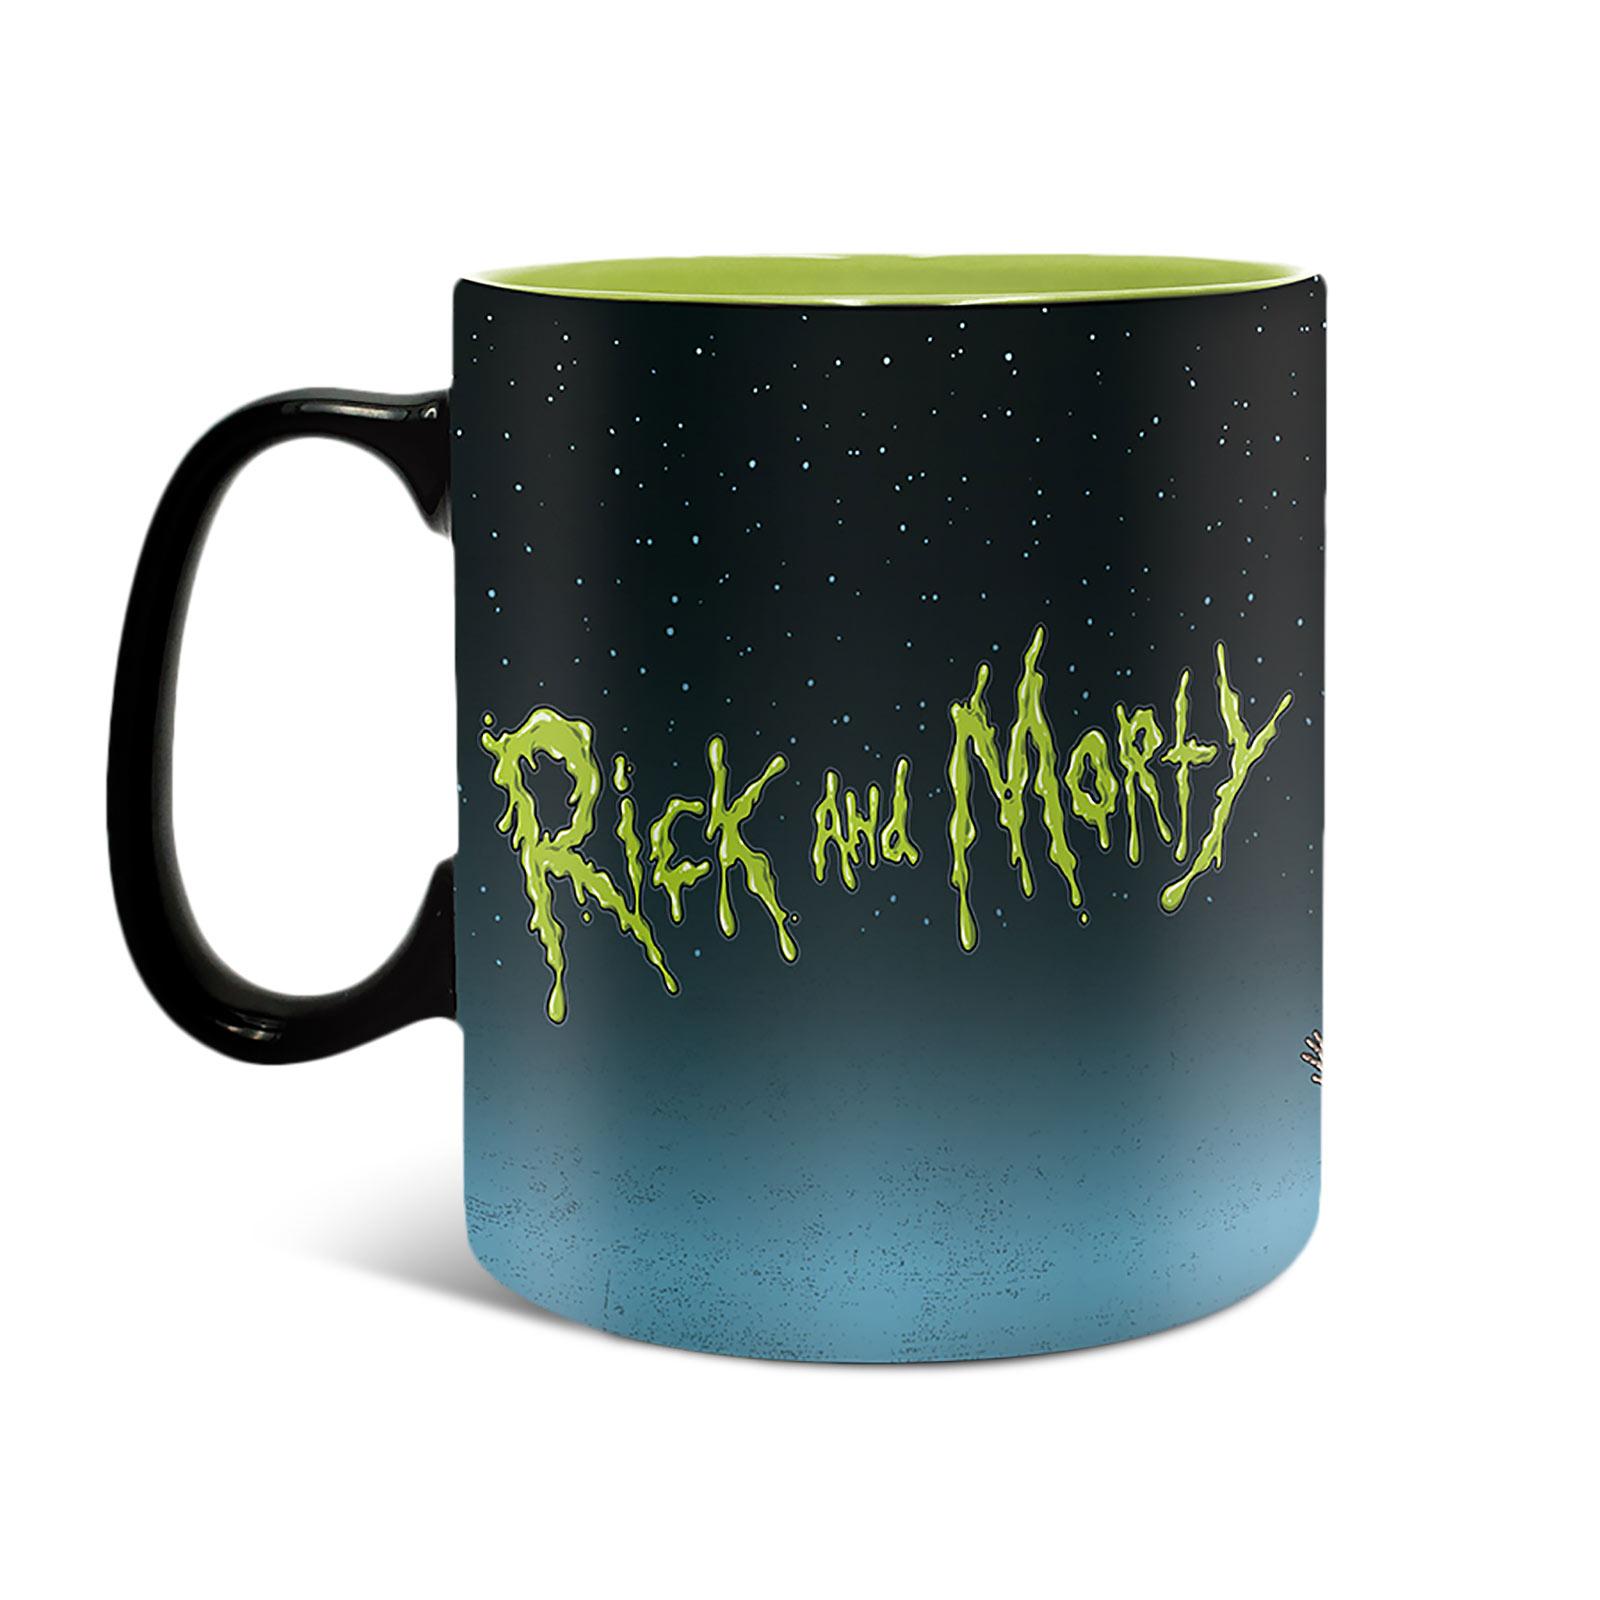 Rick and Morty - Monster Tasse